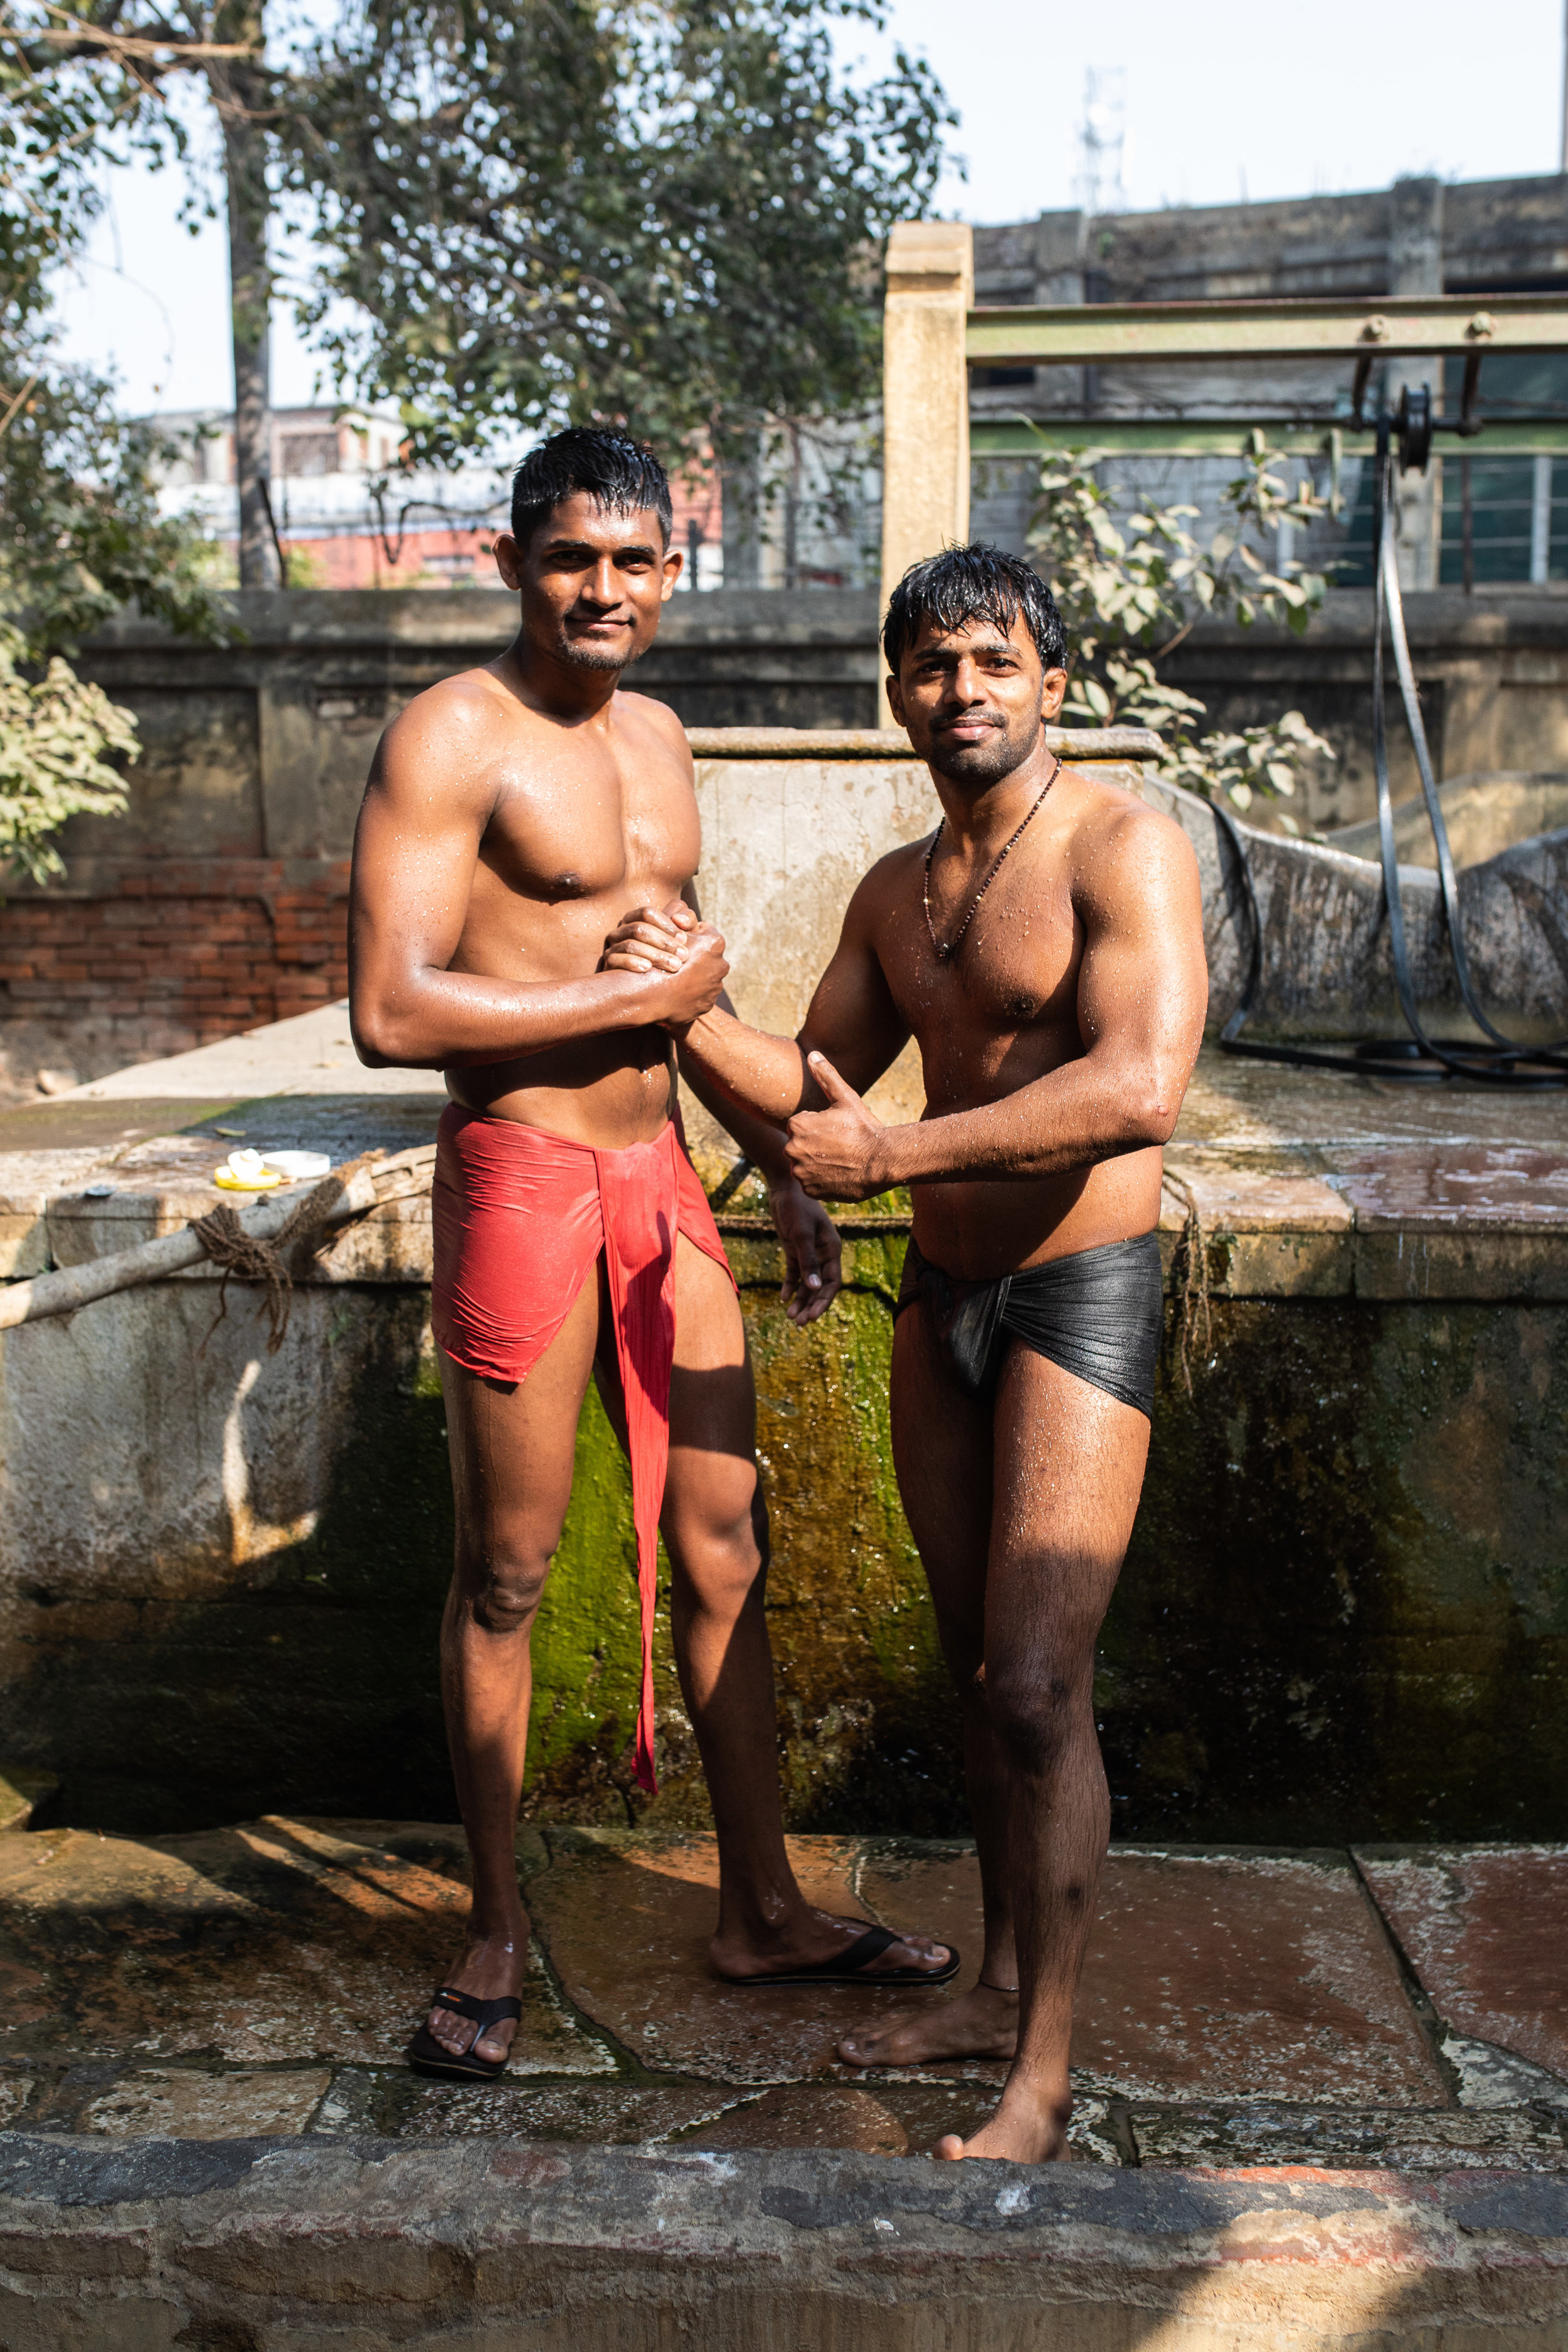 Backpacking India pt4: The Kushti wrestlers of Varanasi